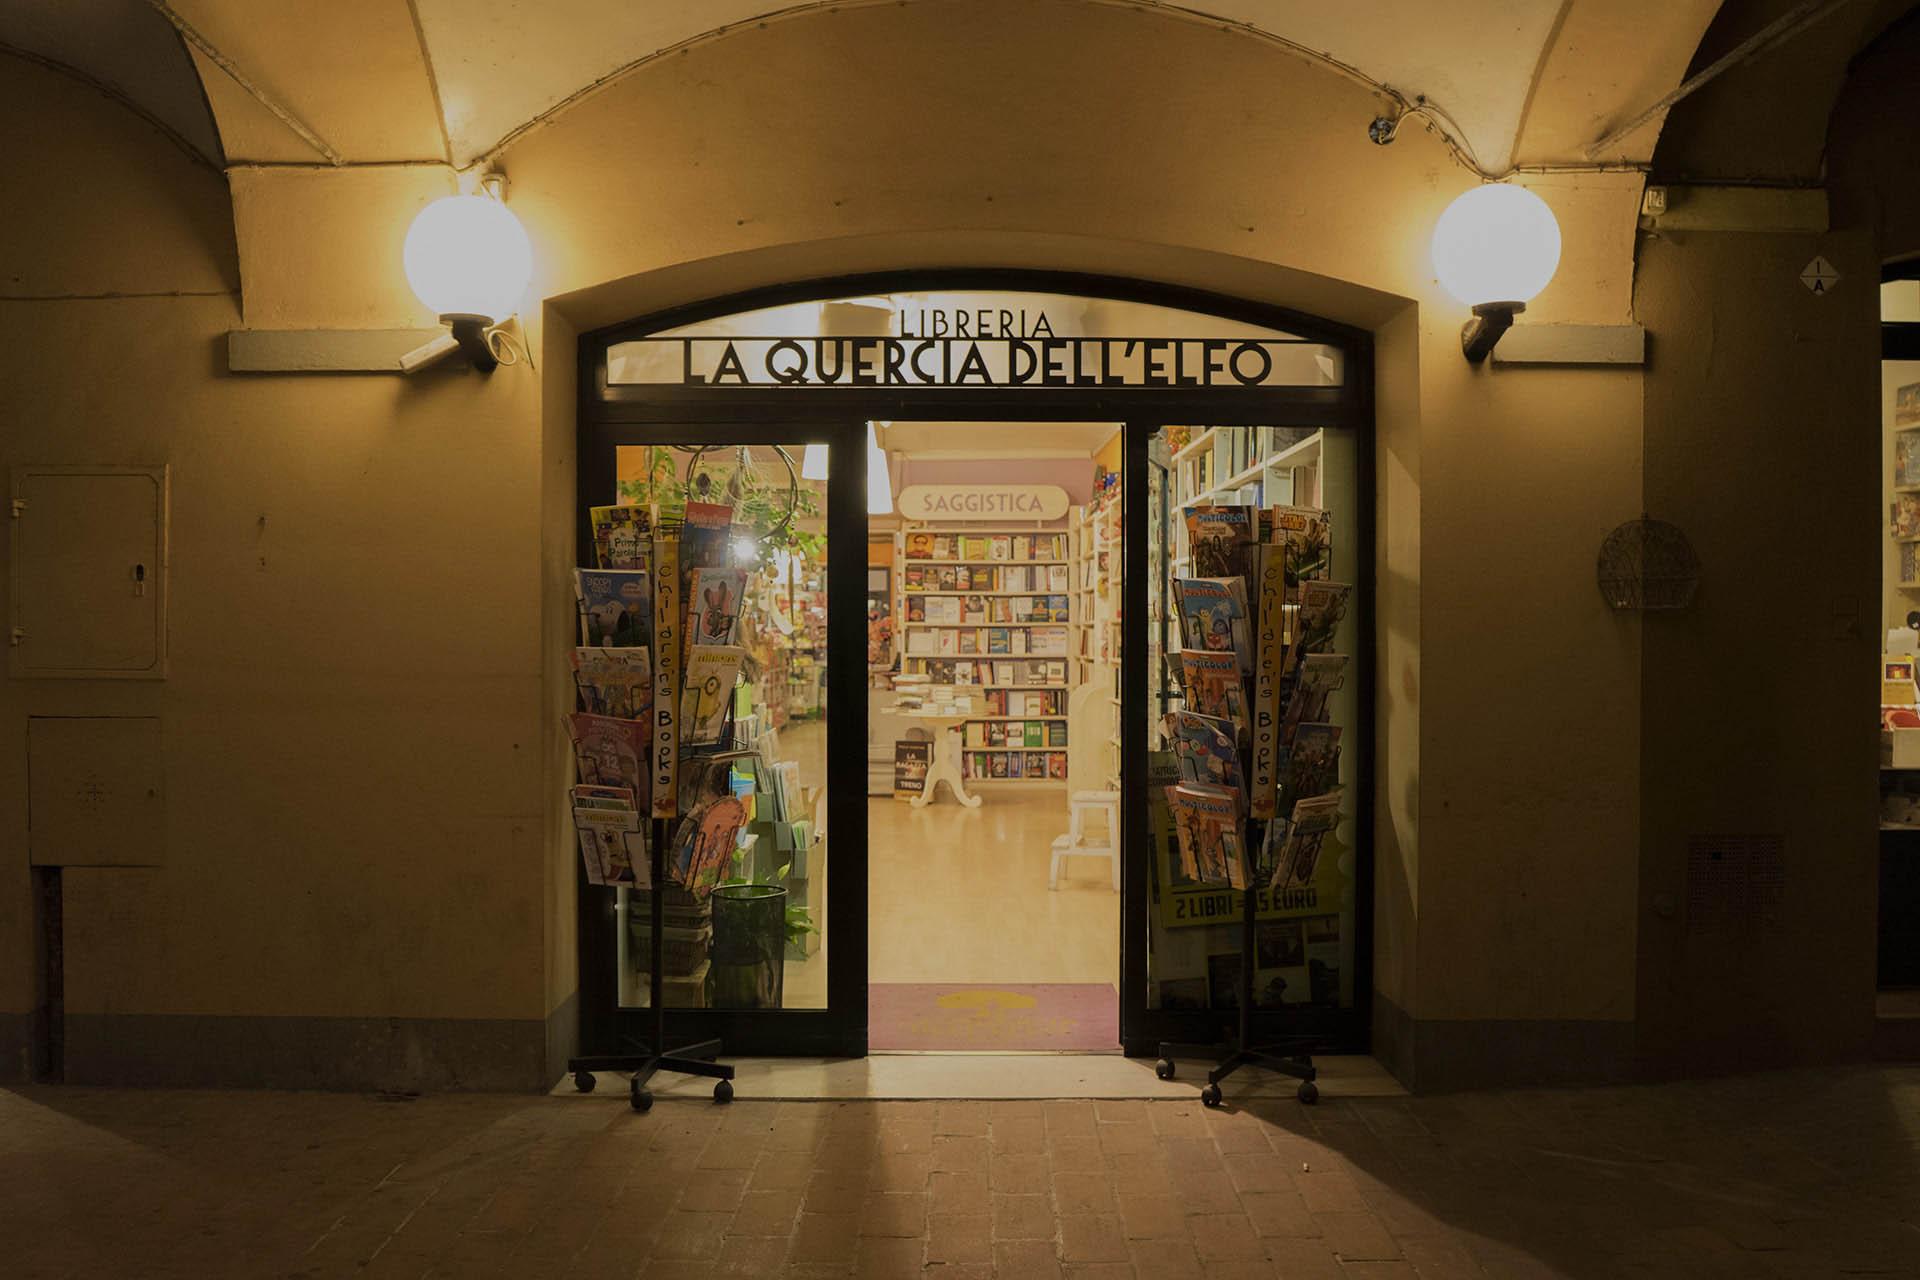 Libreria La Quercia dell'Elfo - Vignola, Modena